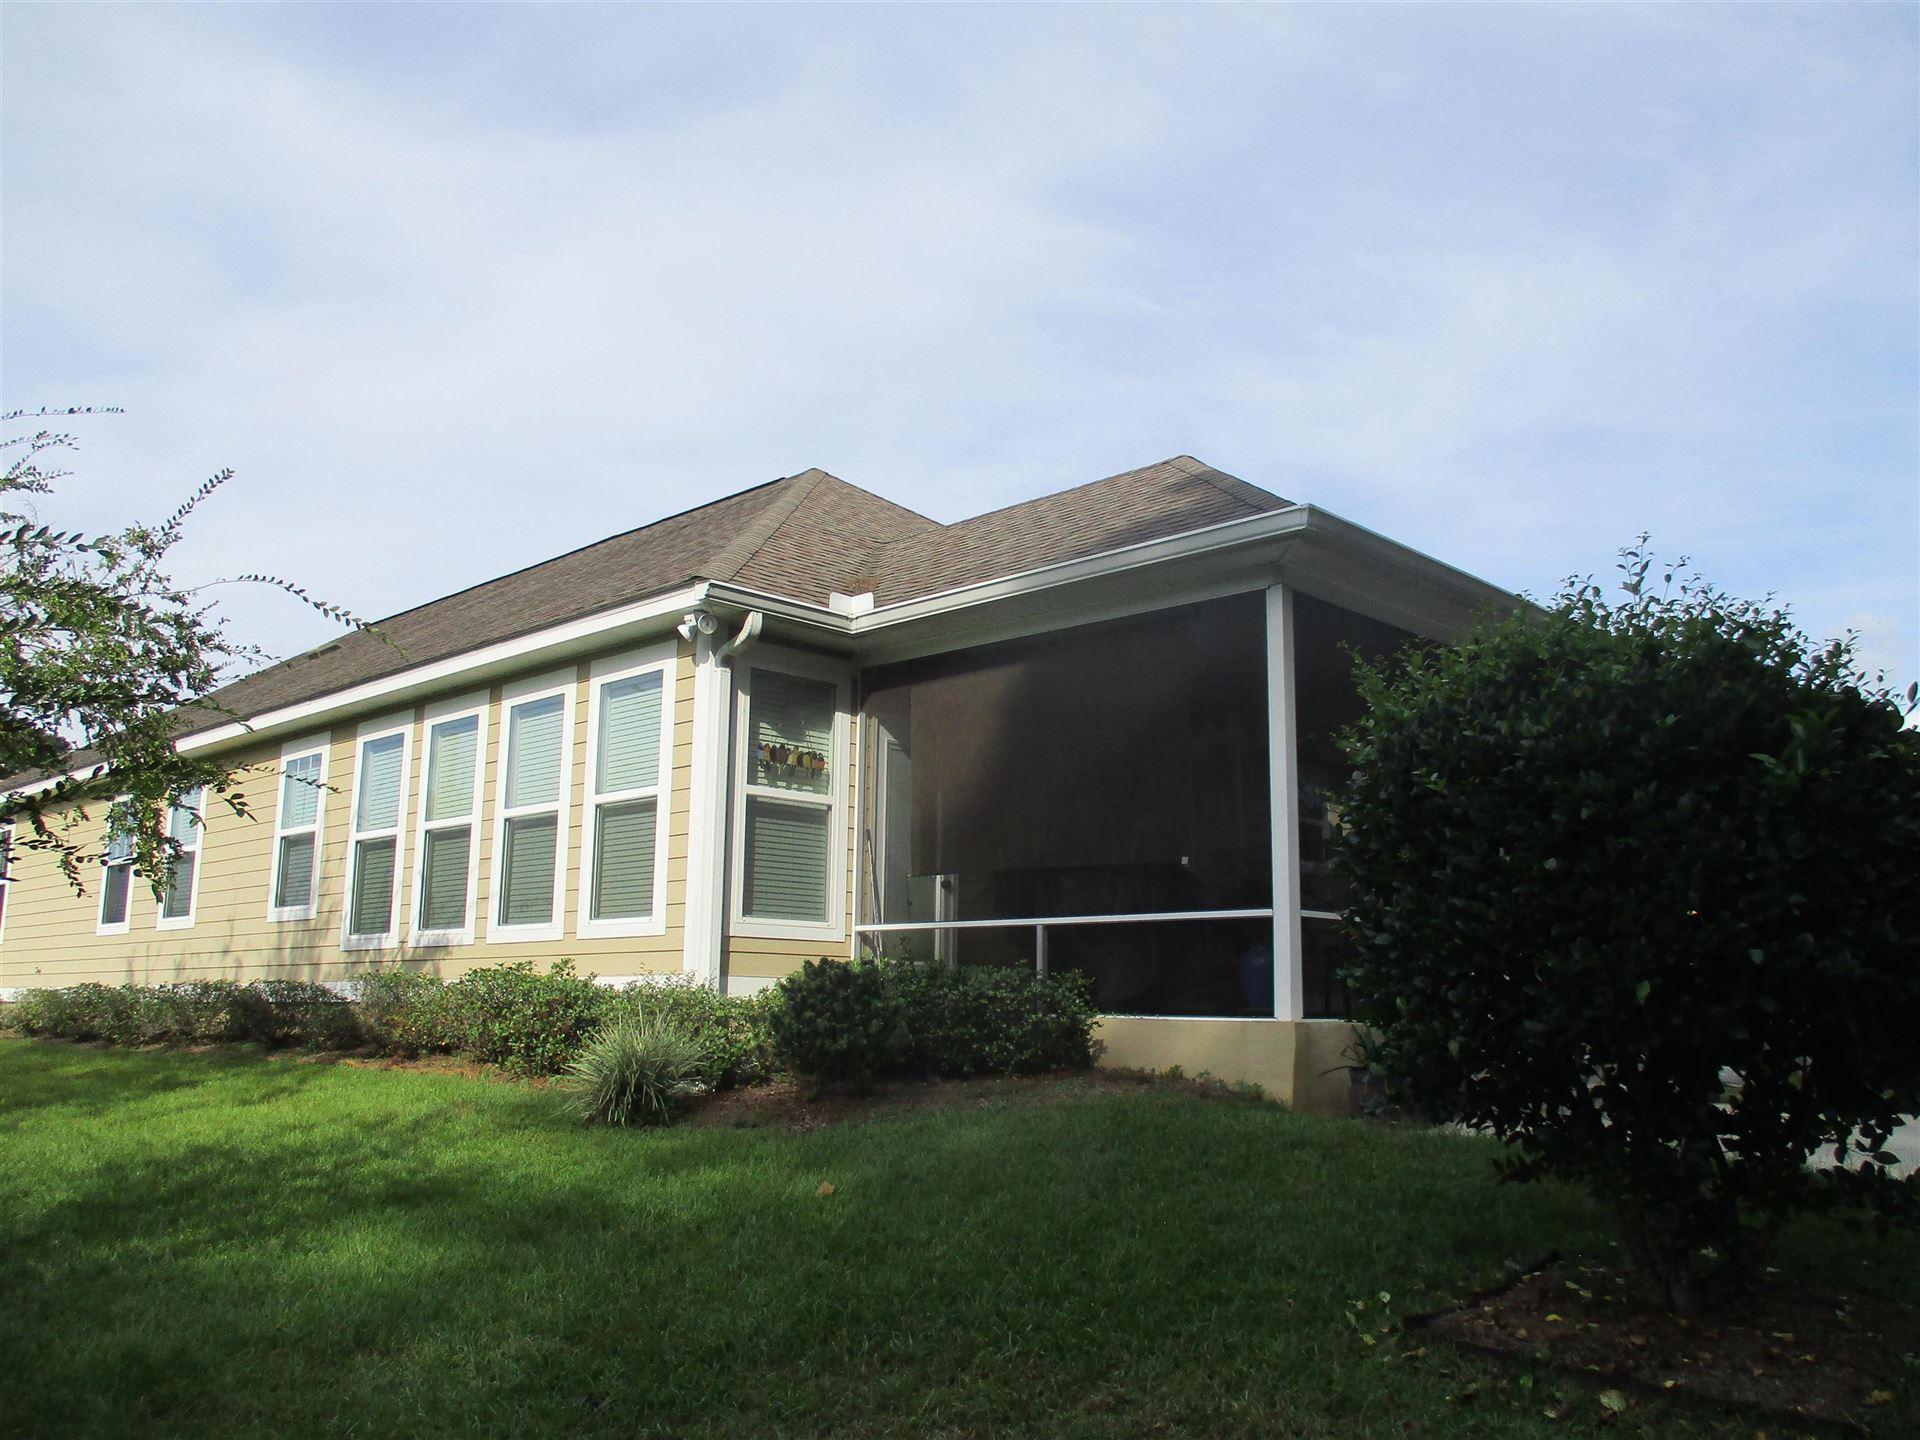 Photo of 3026 Adiron Way, TALLAHASSEE, FL 32317 (MLS # 338357)